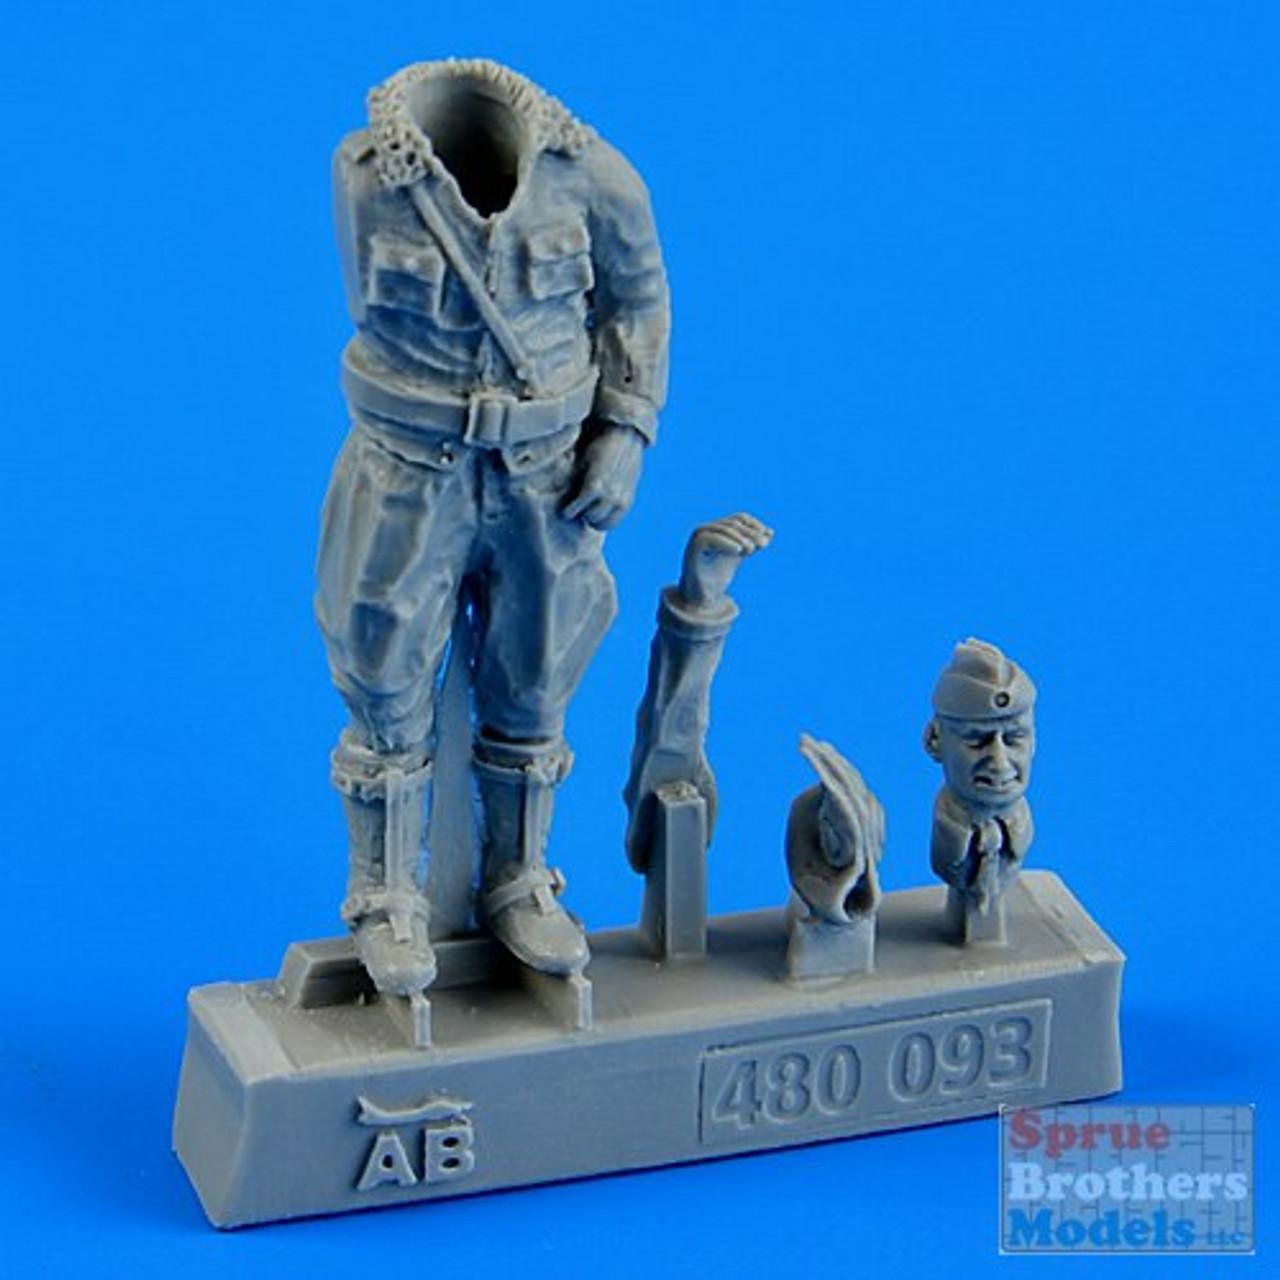 ARSAB480093 1:48 AeroBonus German Luftwaffe Pilot Figure WW2